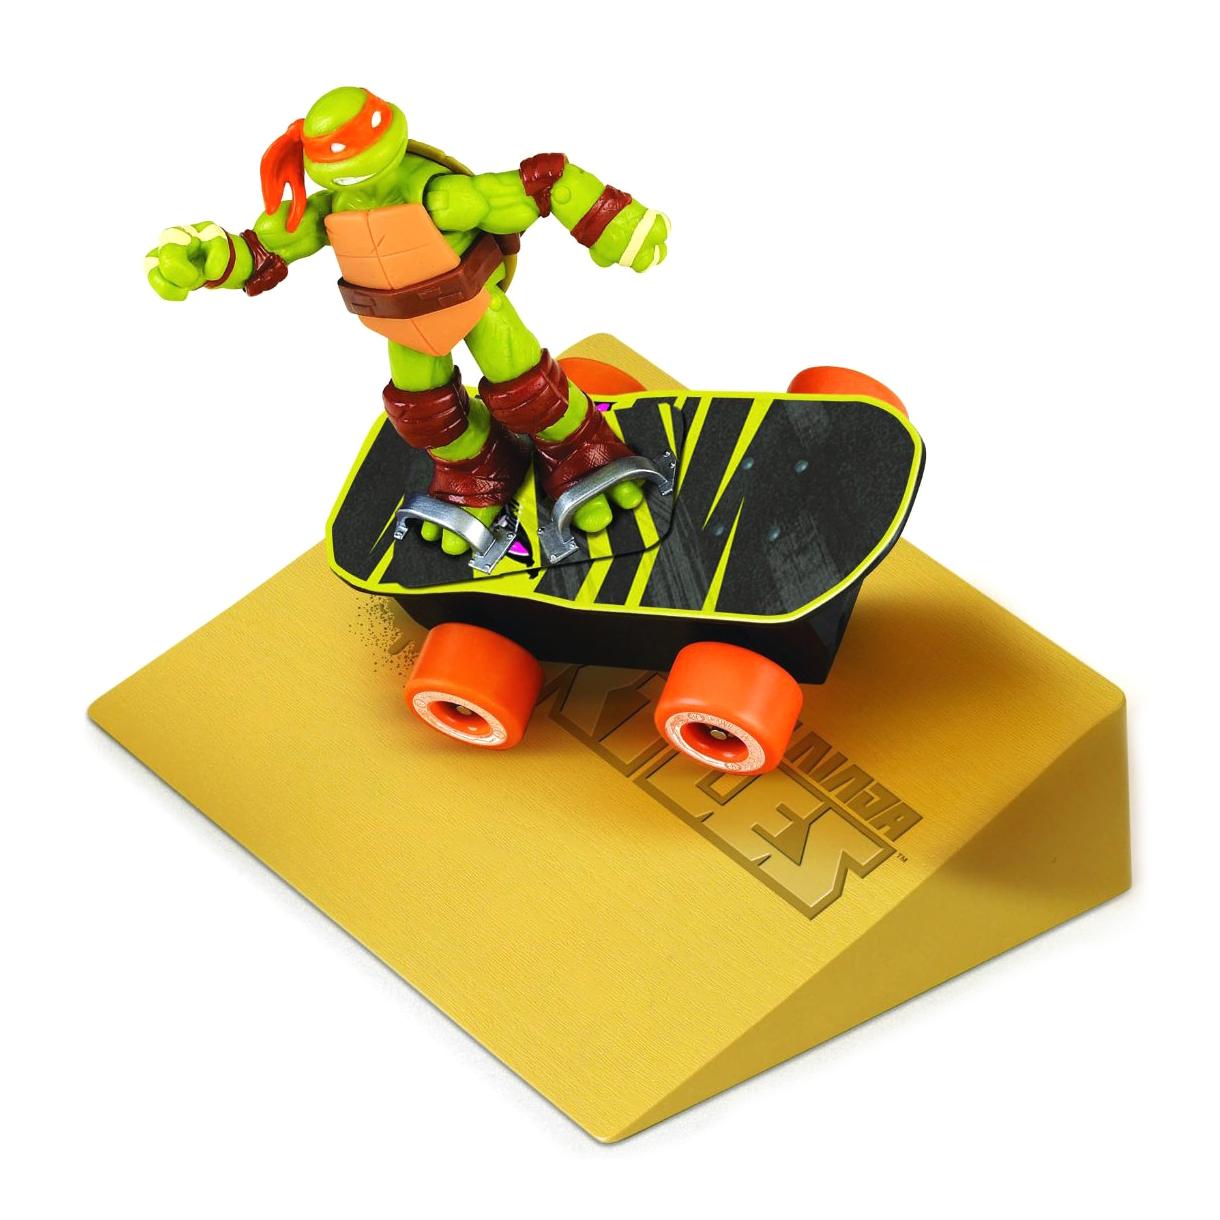 Игровой набор Playmates Черепашки Ниндзя Скейтборд (без фигурки)<br>